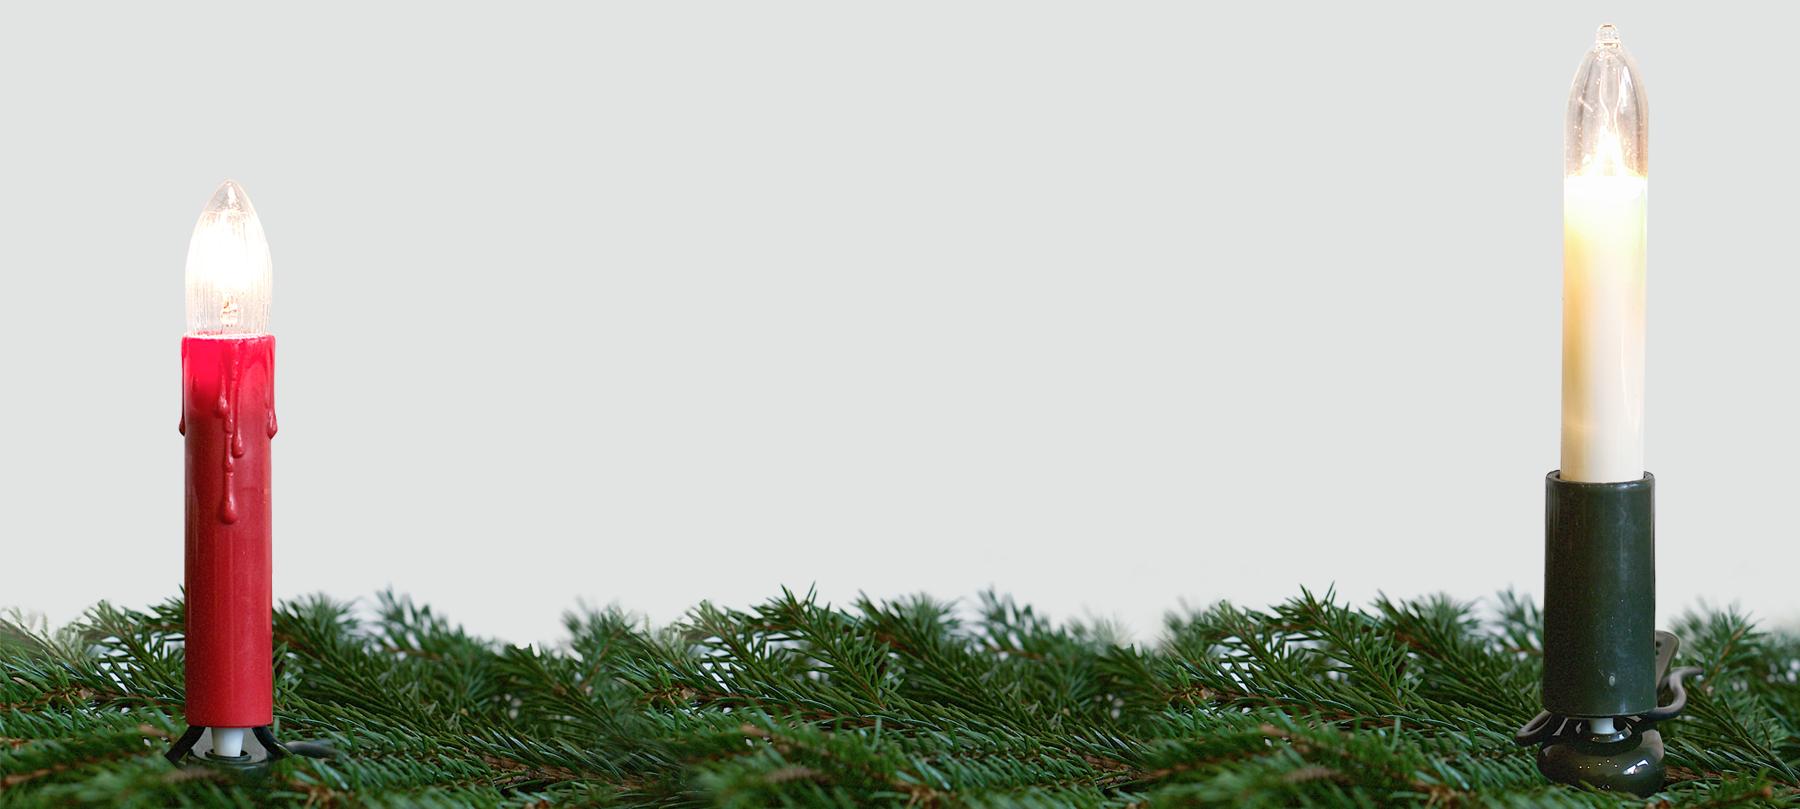 Rotpfeil Weihnachtsbeleuchtung.Moderne Trifft Tradition